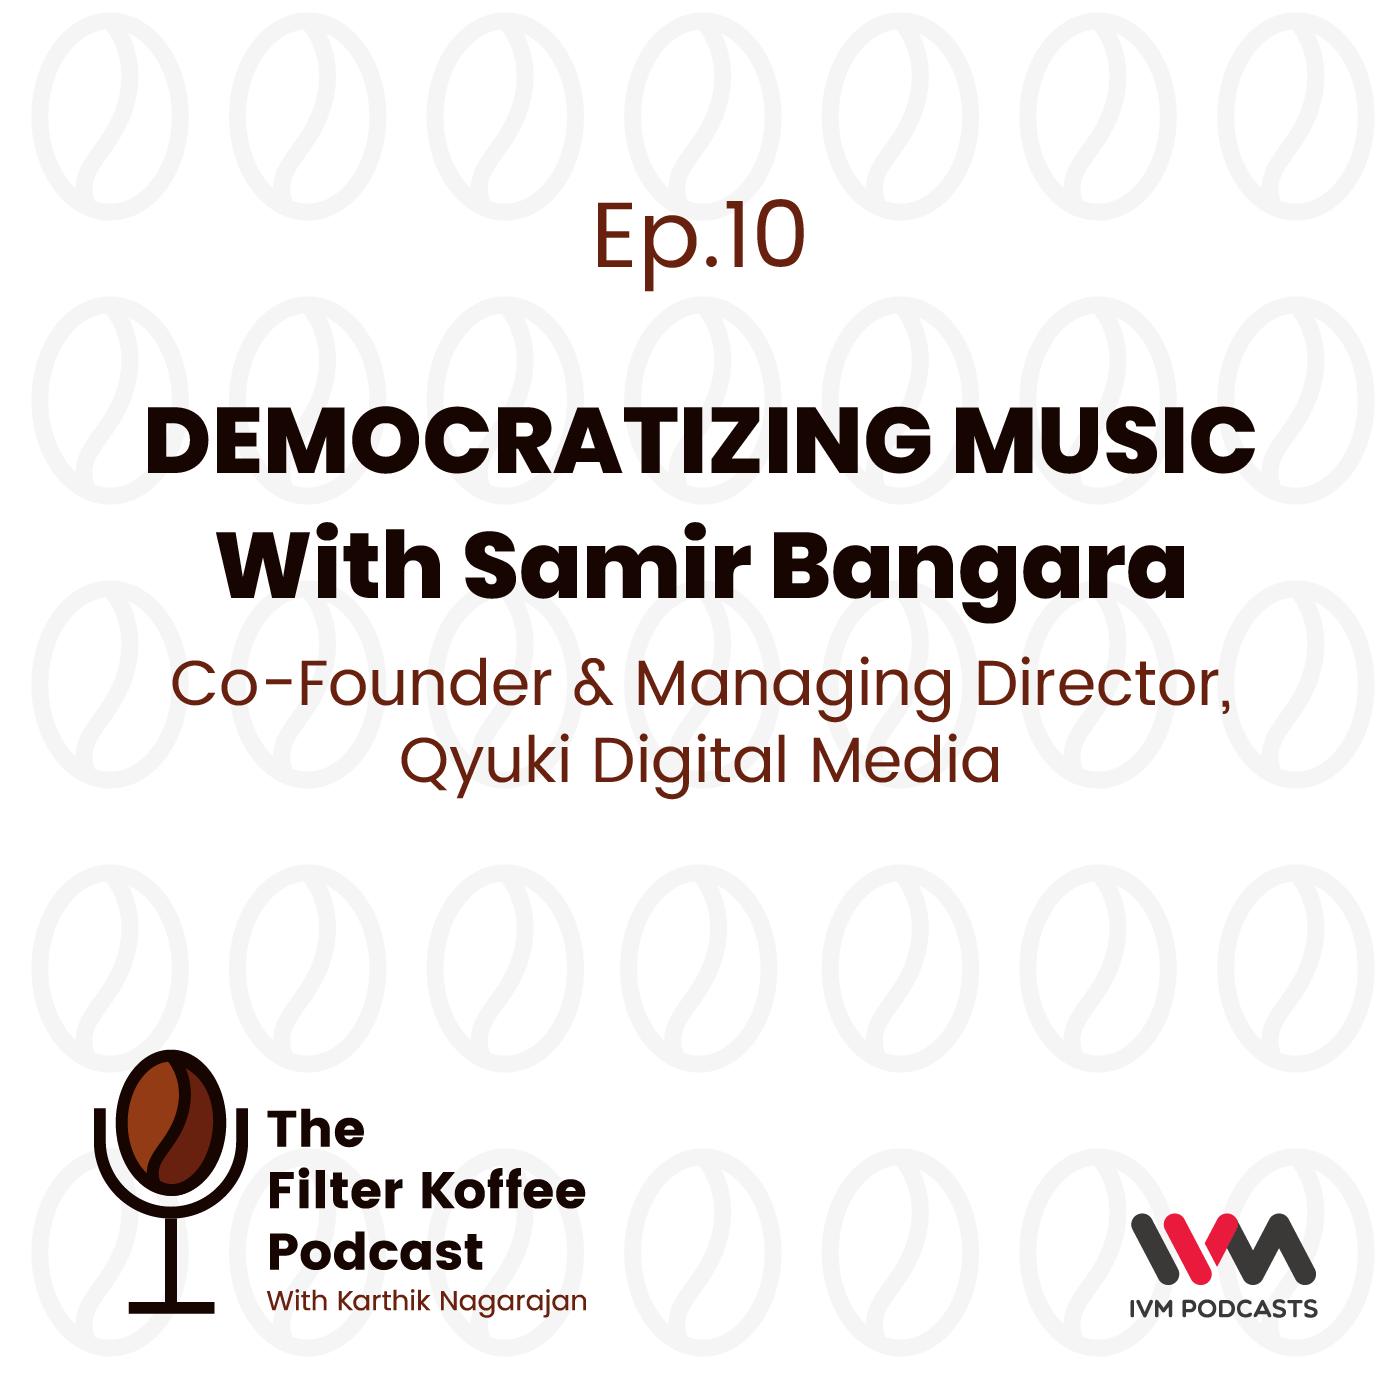 Ep. 10: Democratizing Music with Samir Bangara